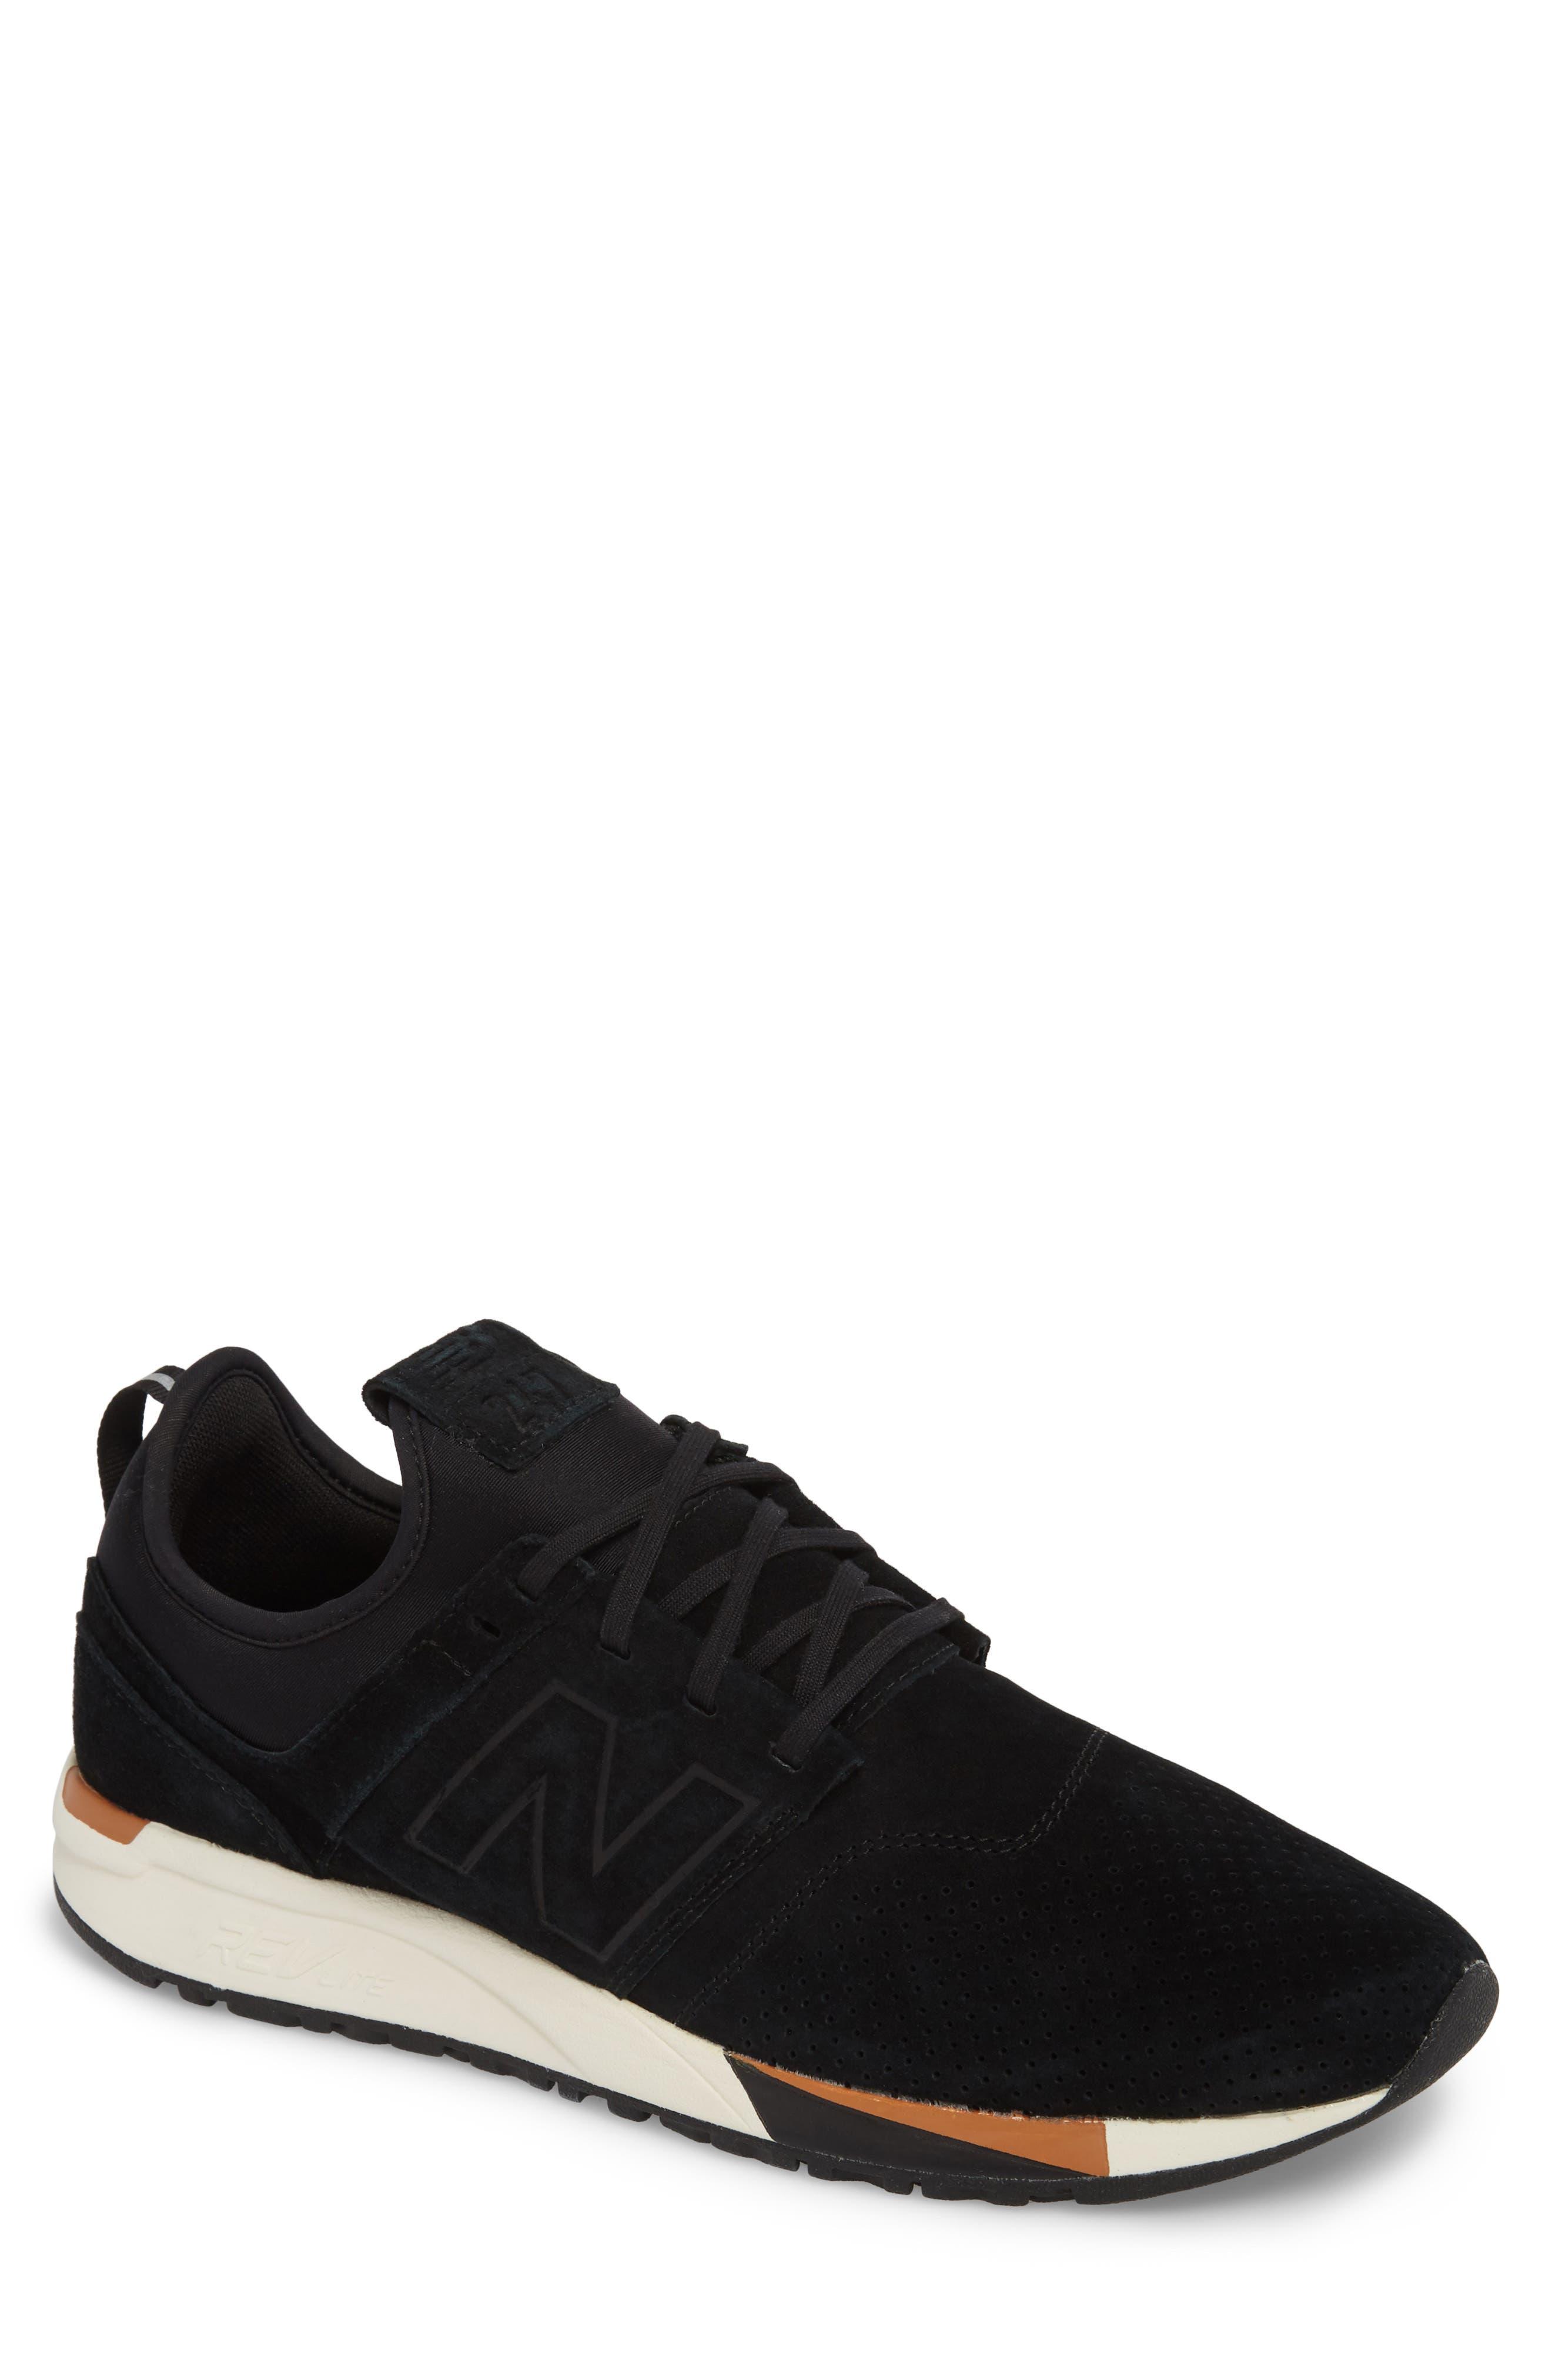 247 Luxe Sneaker,                         Main,                         color, Black